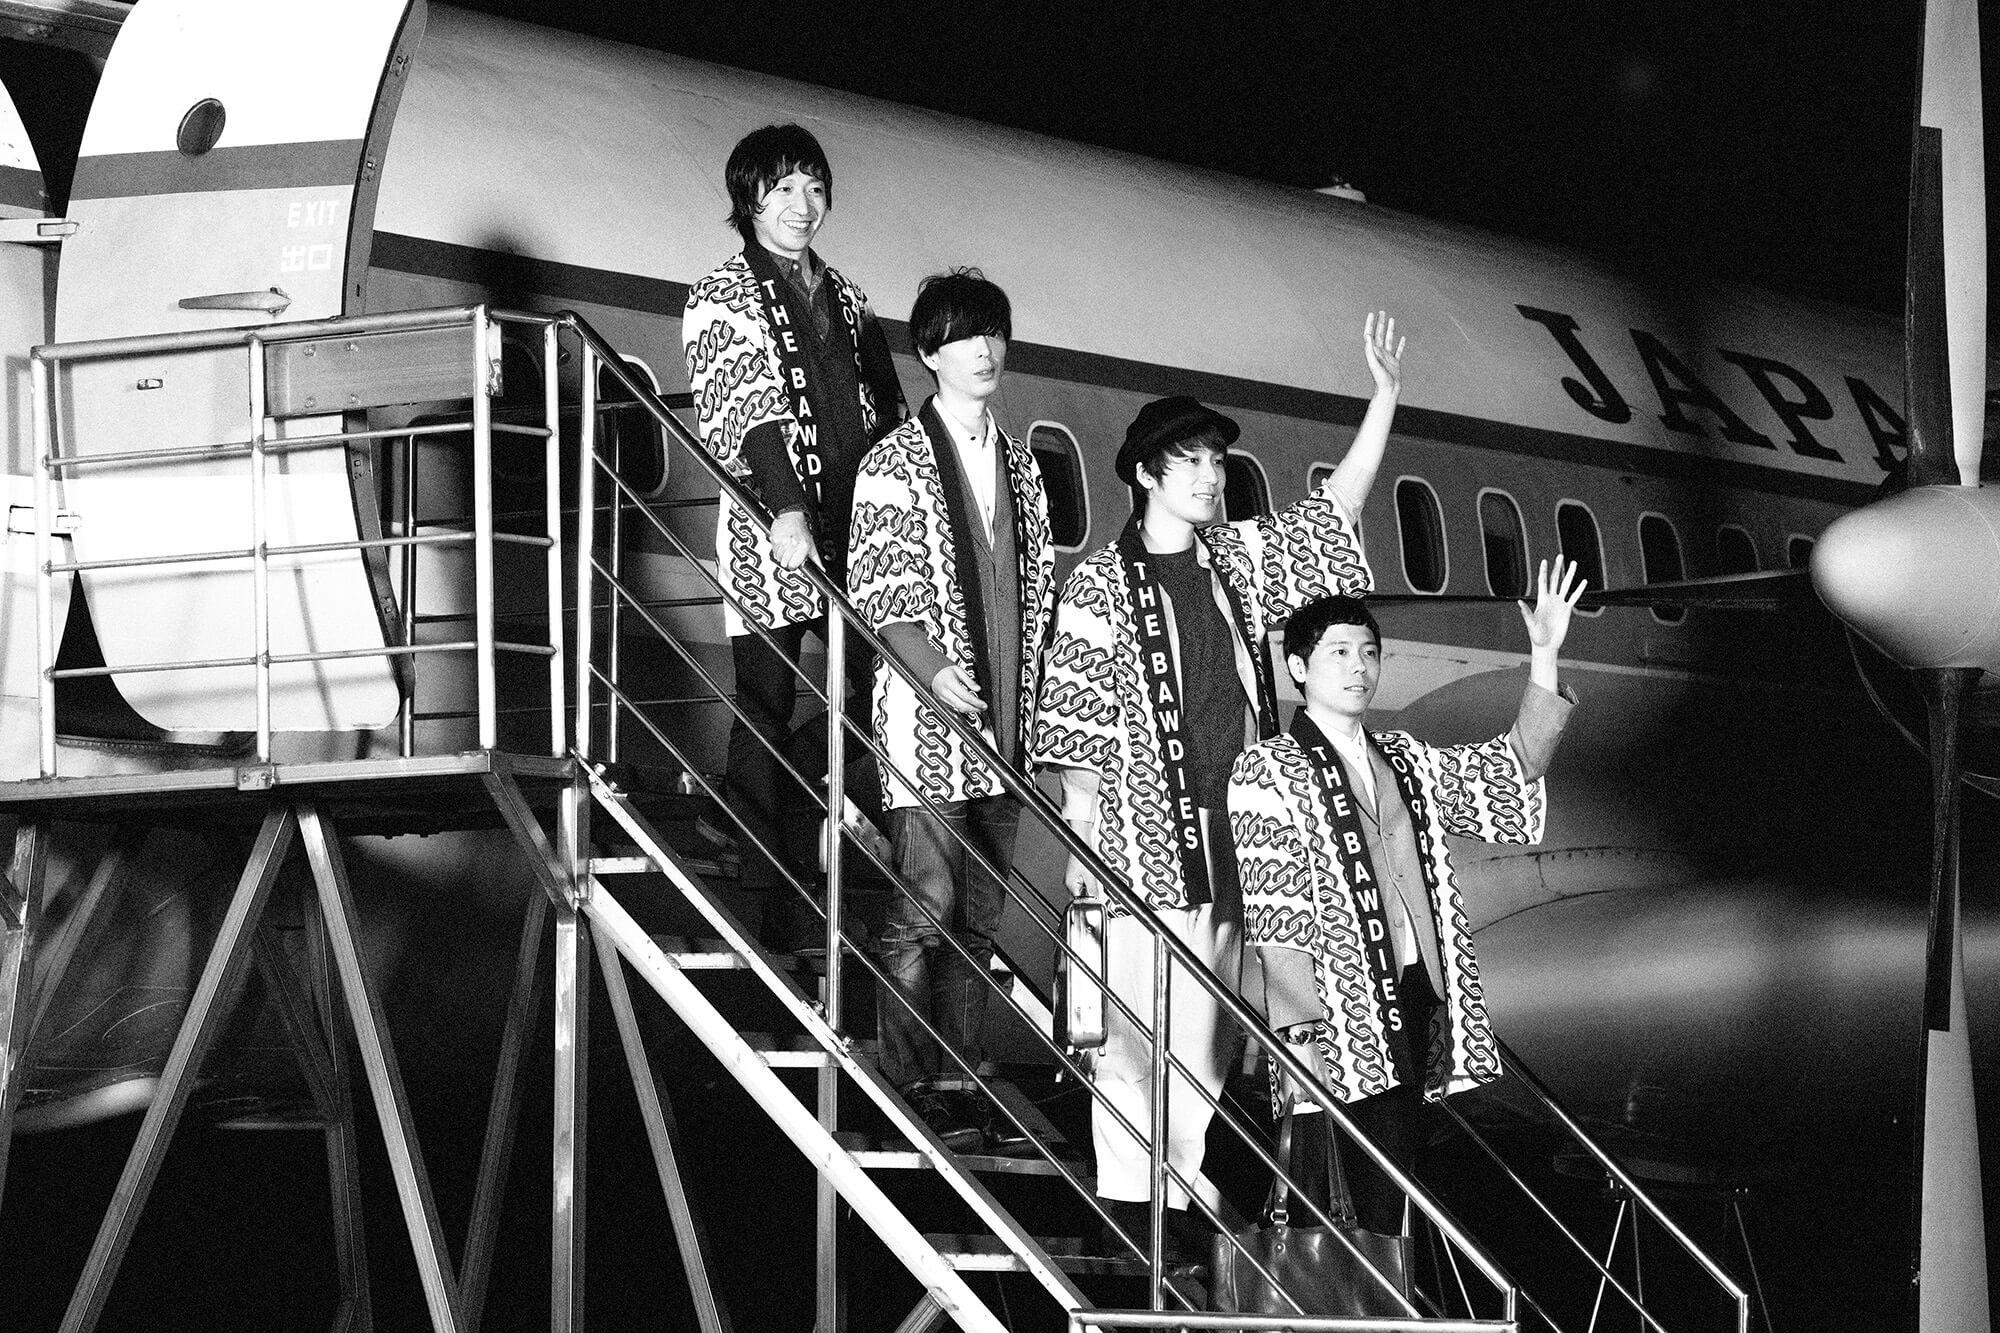 THE BAWDIES 日本武道館公演作品の特典映像&ブックレット詳細、ジャケット写真撮影メイキング映像公開